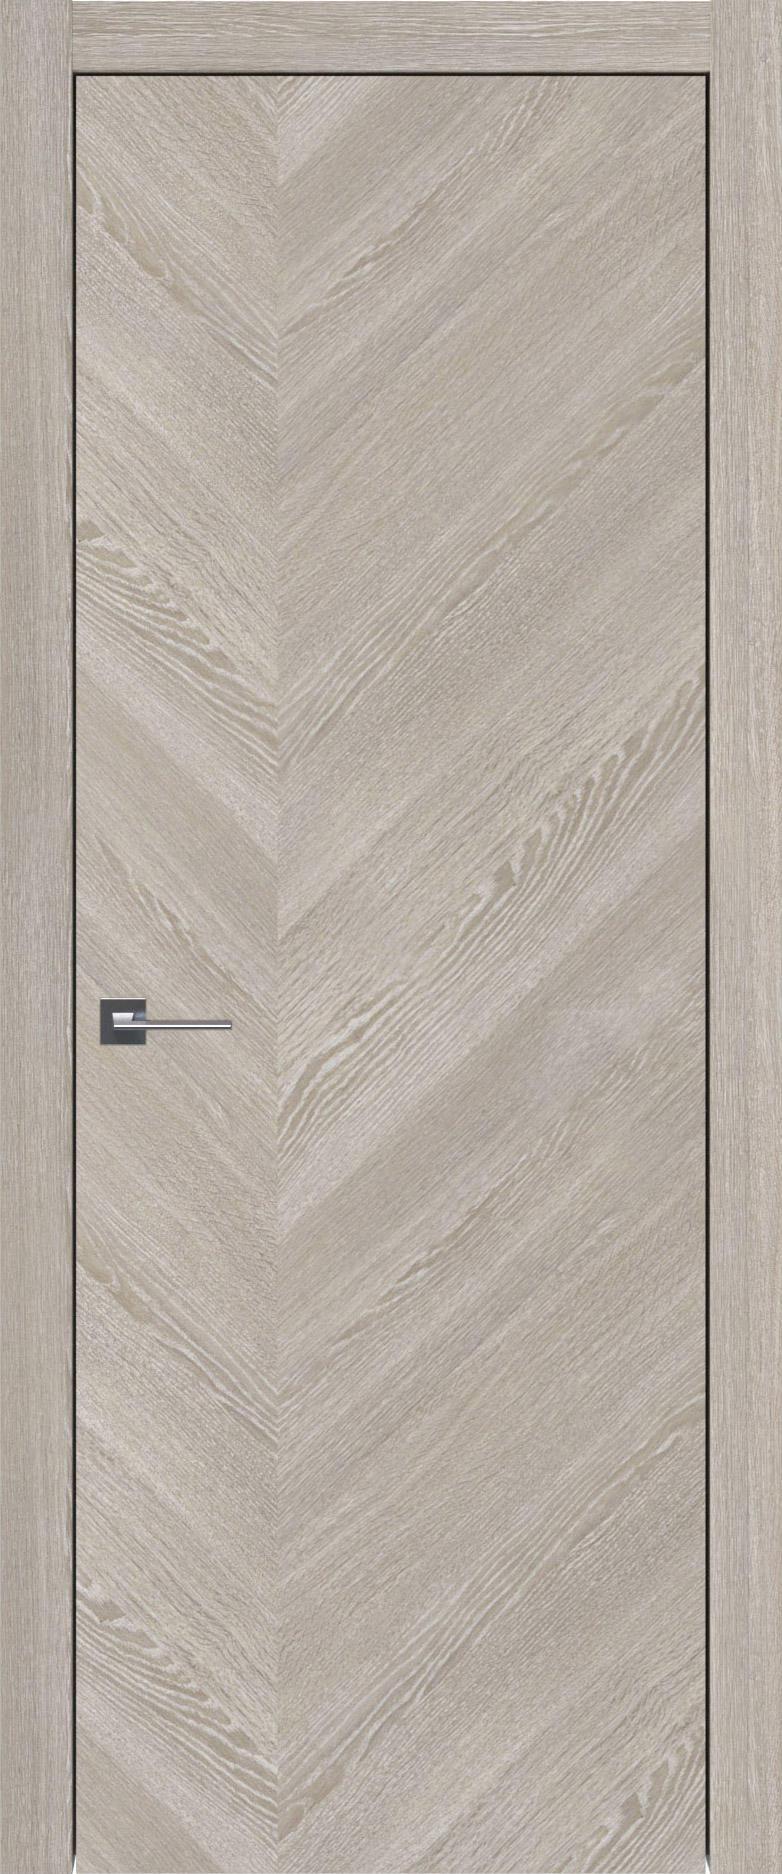 Tivoli Л-1 цвет - Серый дуб Без стекла (ДГ)